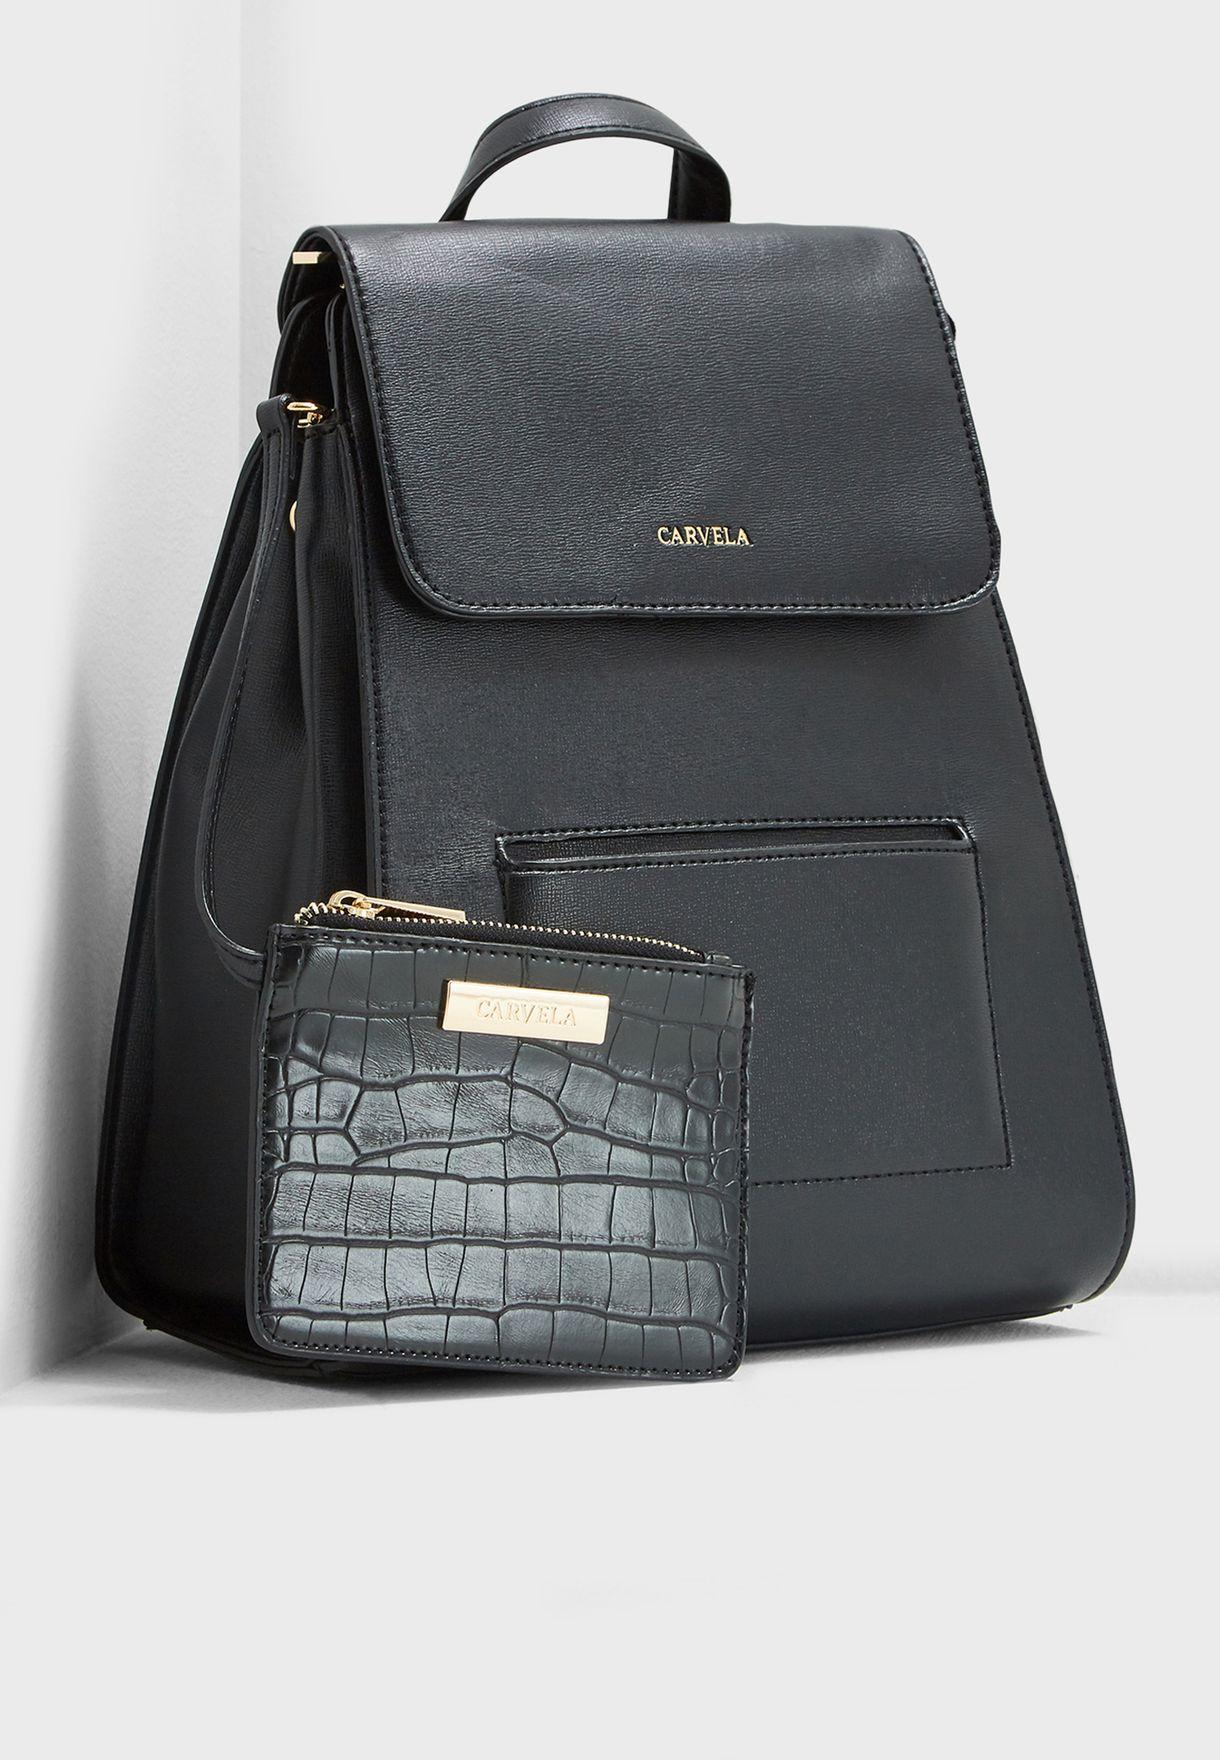 676e538373 Shop Carvela Kurt Geiger black Slinky Backpack SLINKY for Women in ...